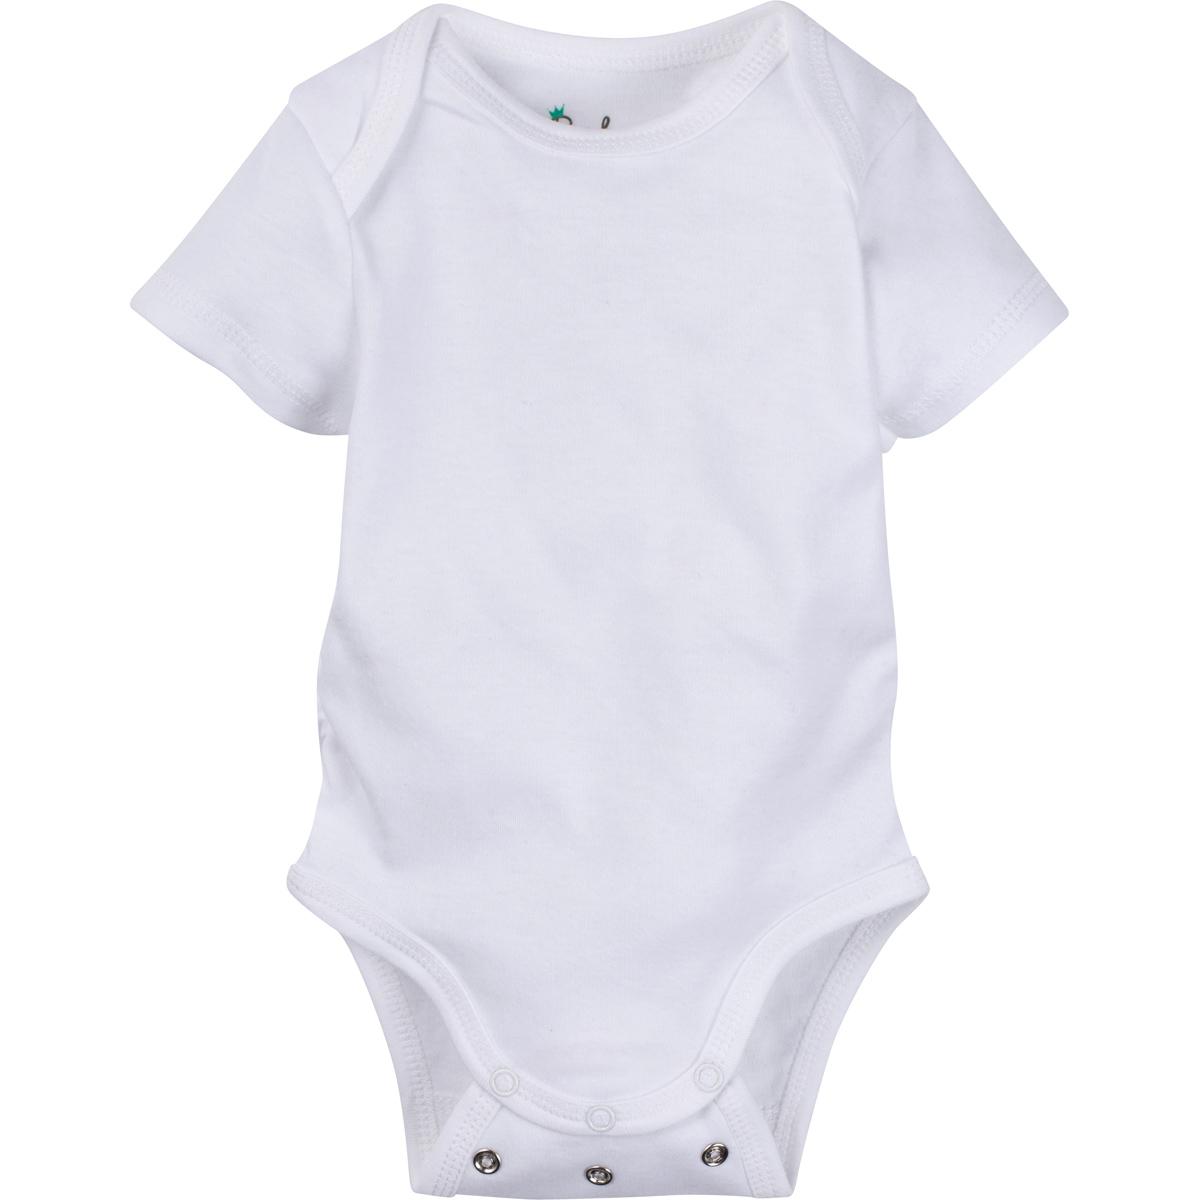 Solid White Adjustable Bodysuit Short-Sleeve